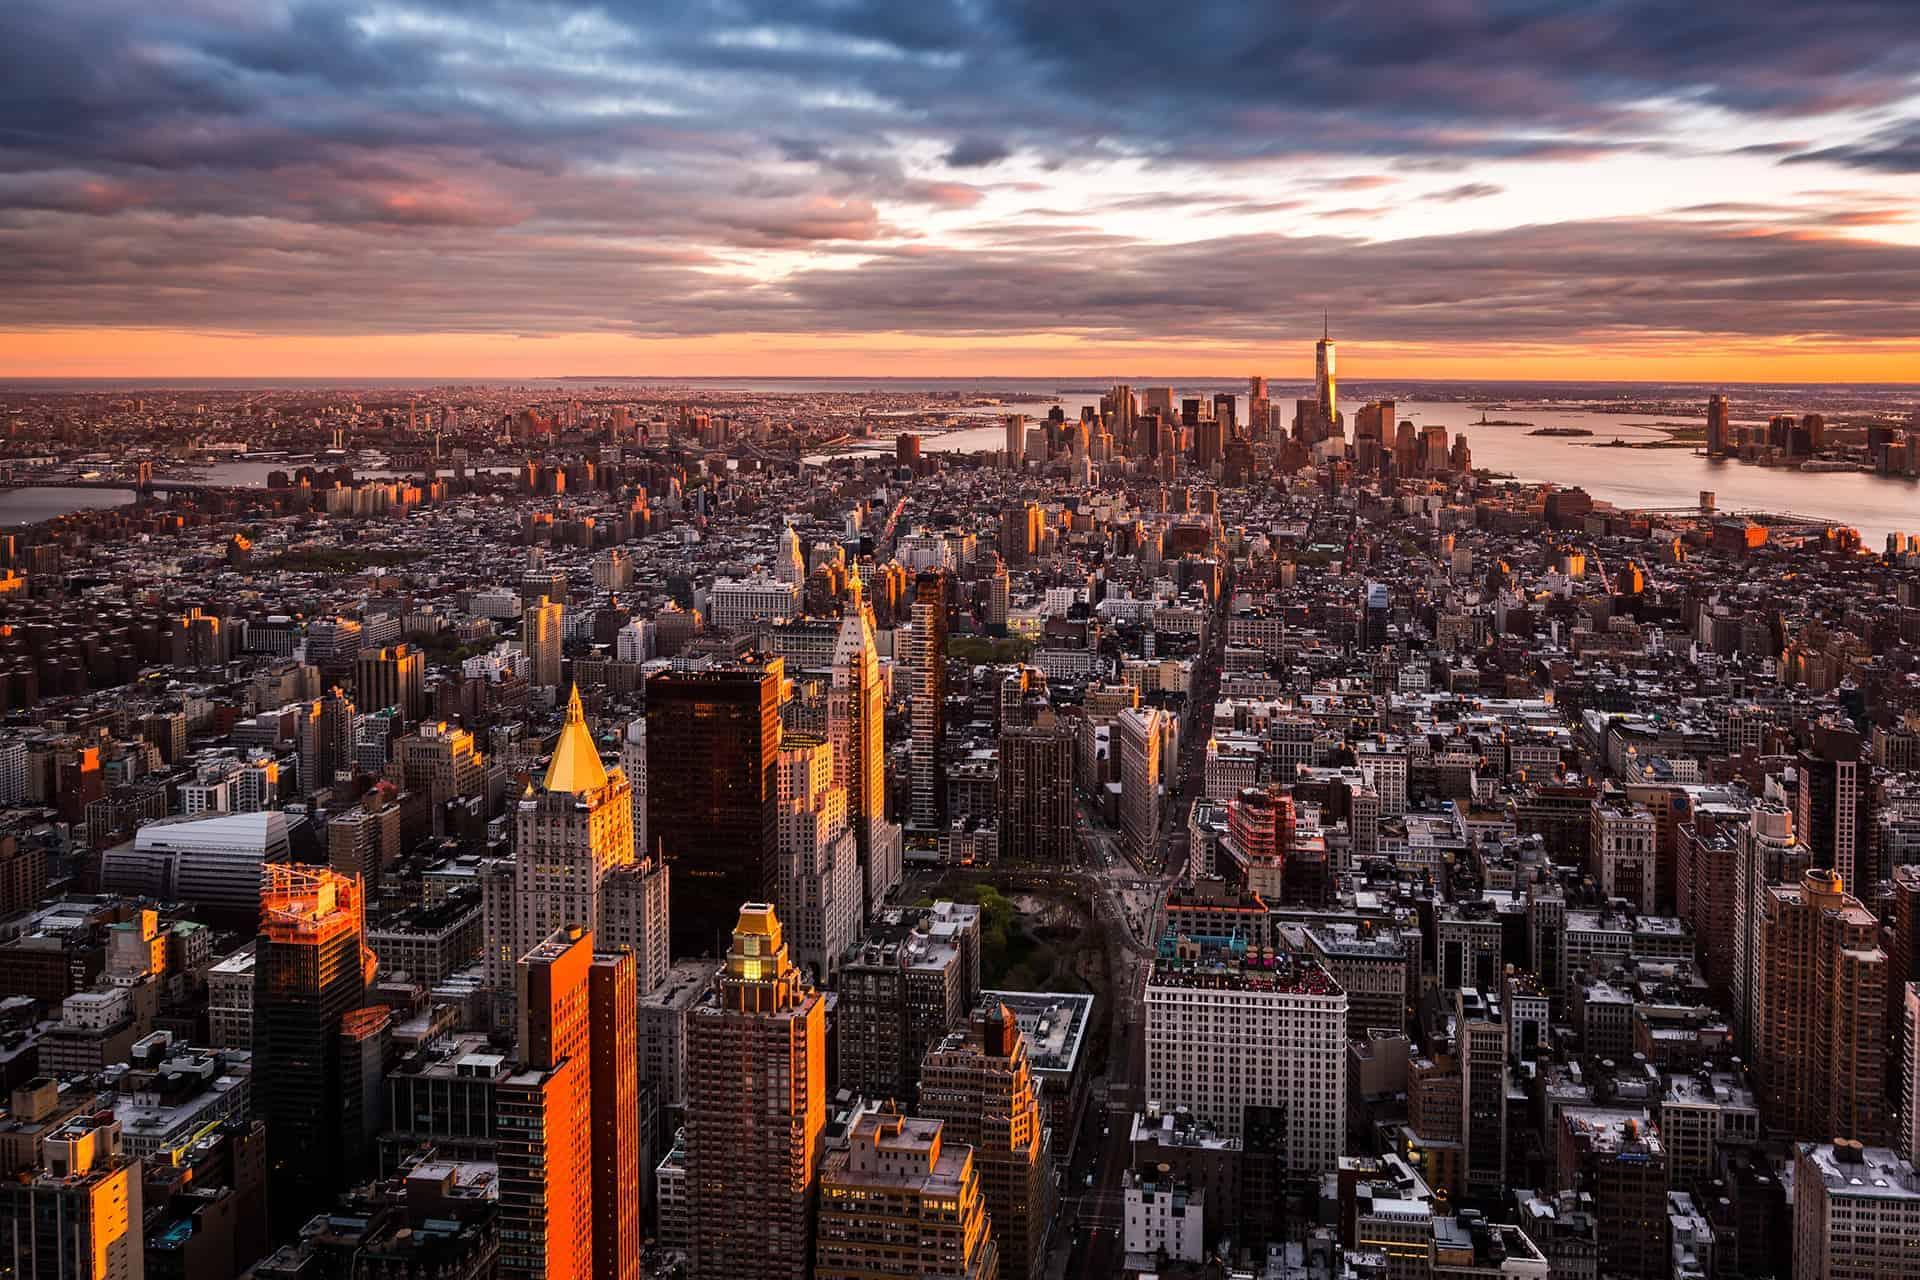 visiter new york facilement